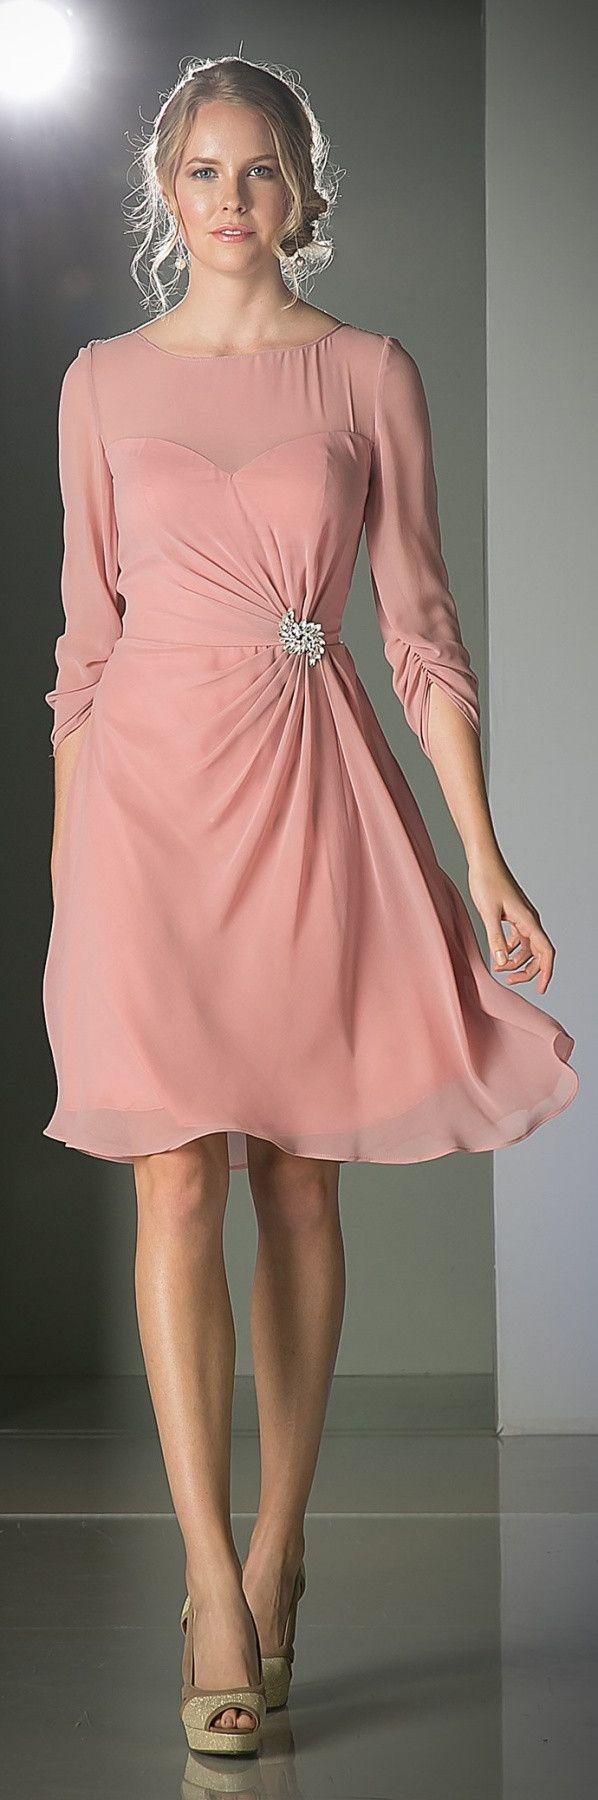 Scoop Neckline 3/4 Sleeves Cocktail Dress Rose Knee Length